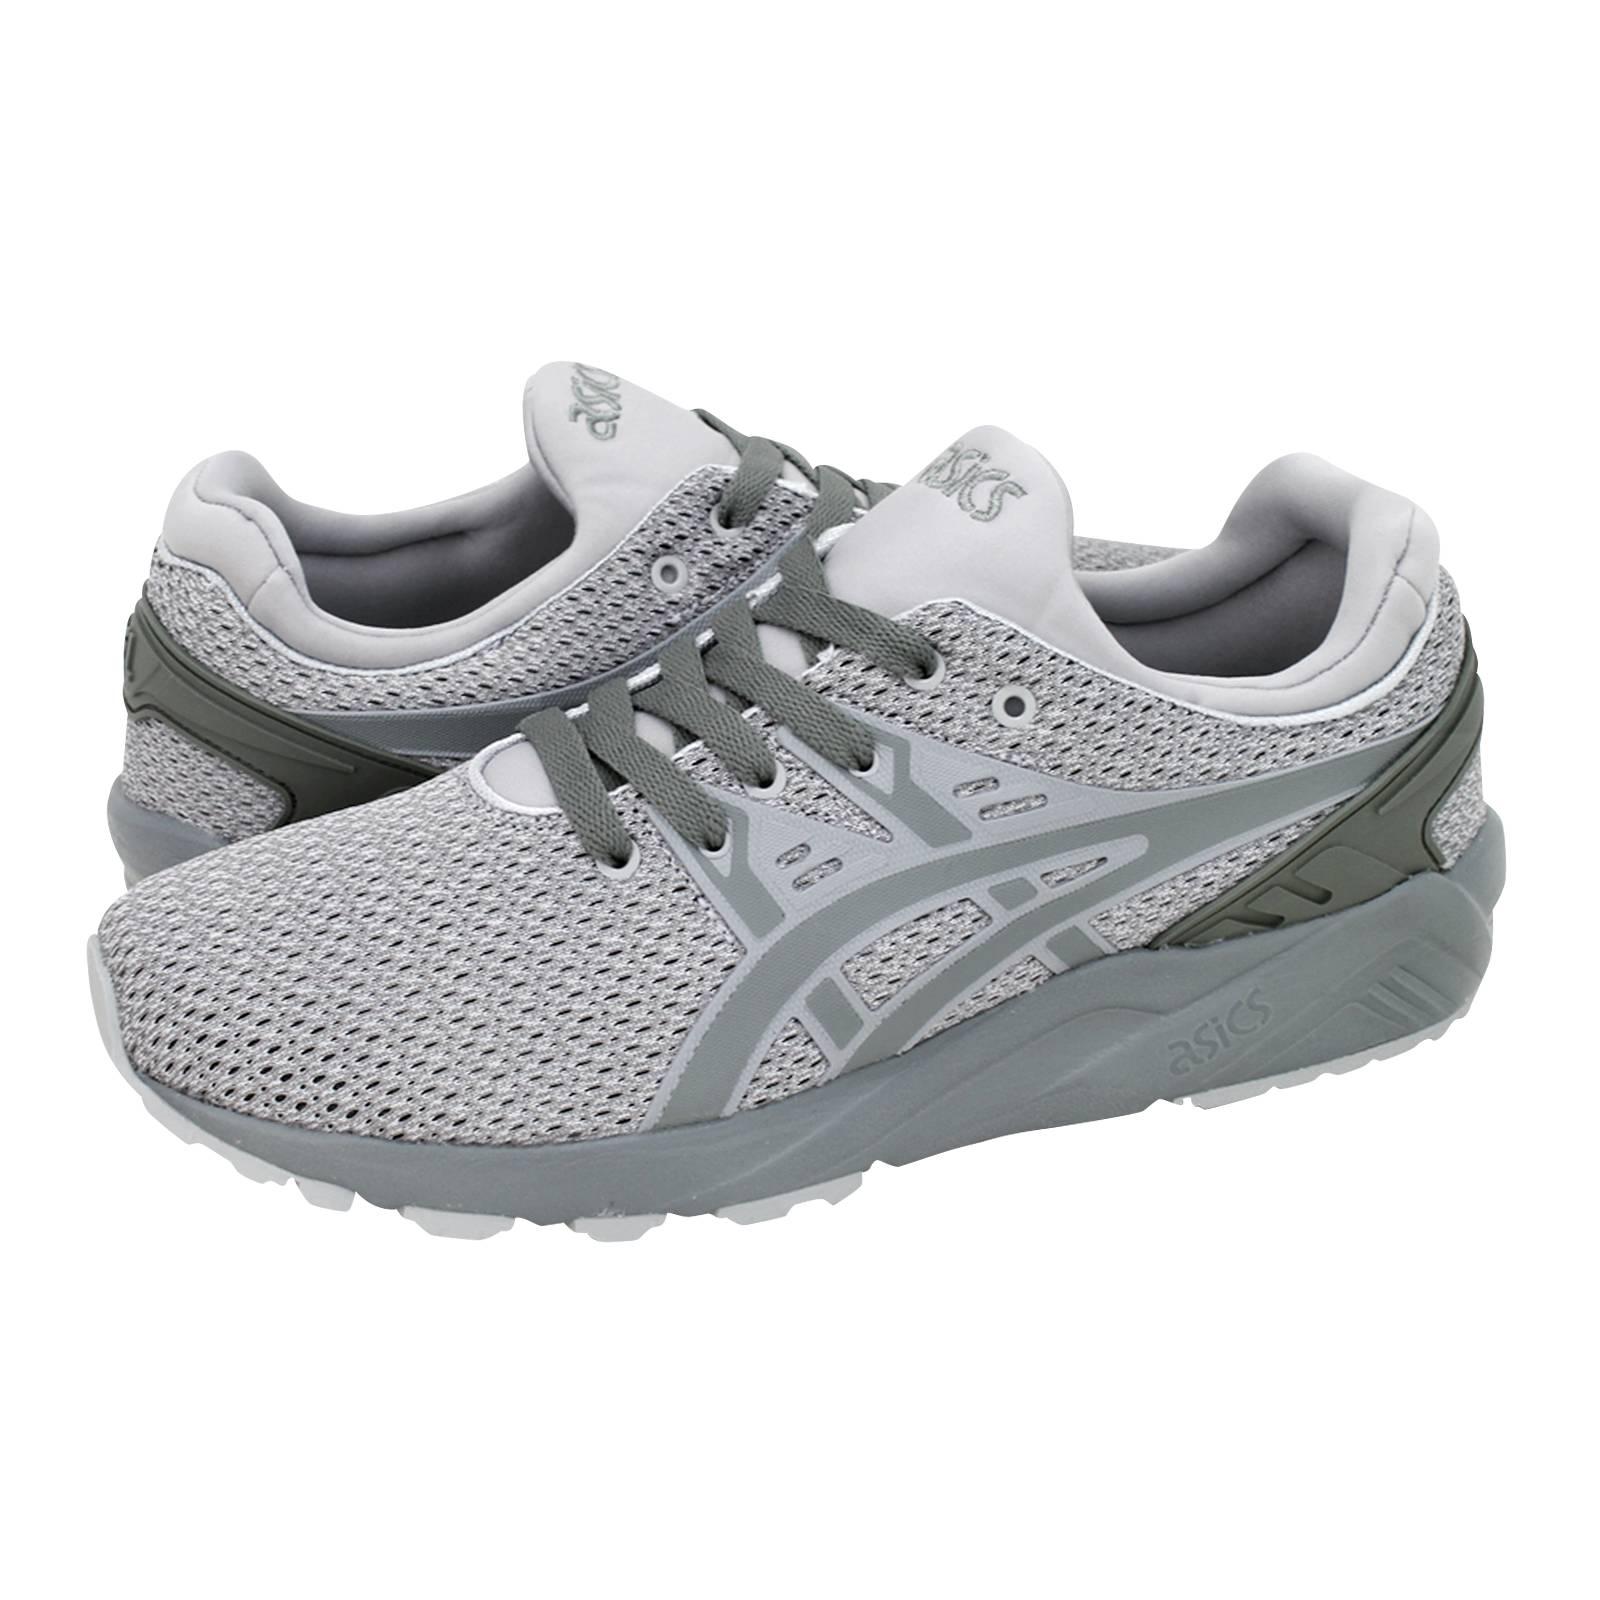 Asics Gel Kayano Trainer Evo athletic shoes